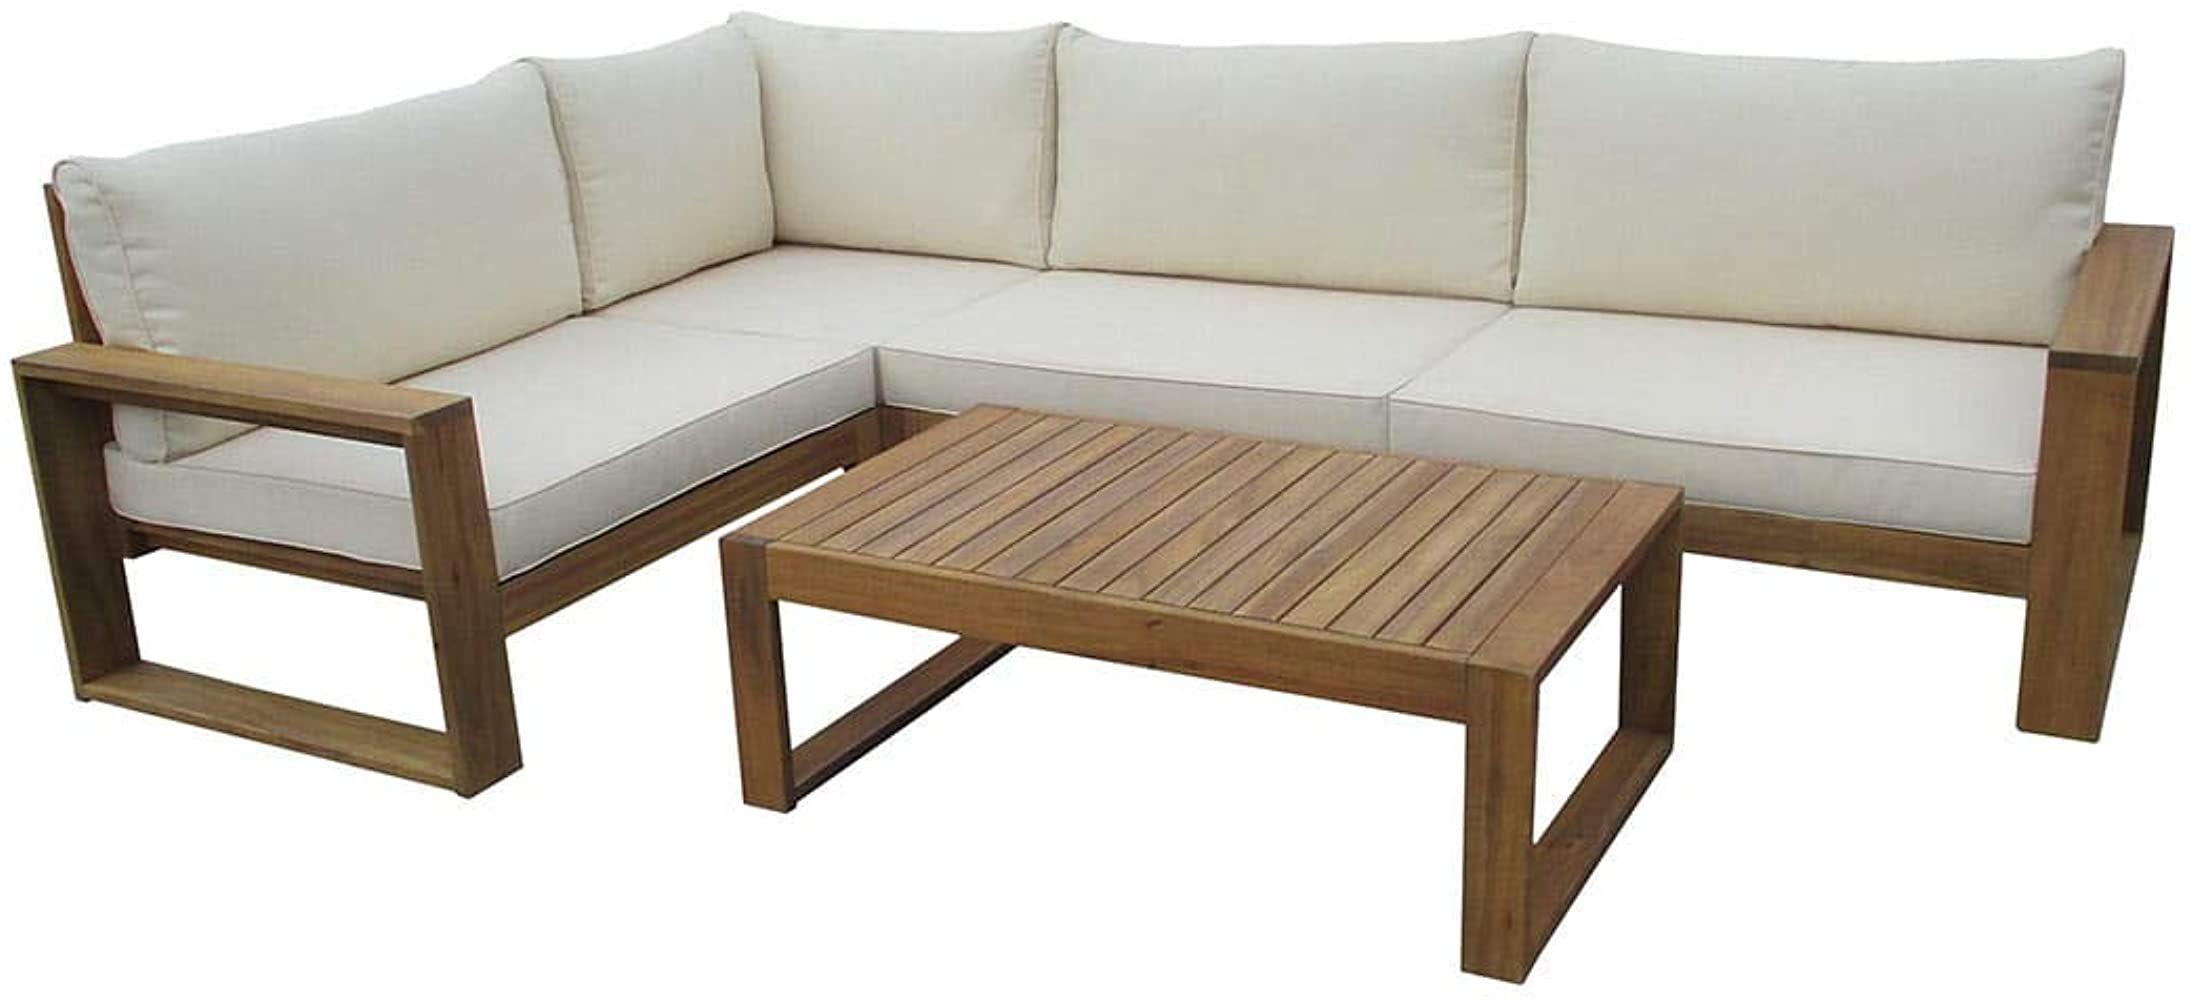 Full Size of Outliv Loungemöbel Loungembel Holz Santa Cruz Outdoor 5 Teilig Garten Günstig Wohnzimmer Outliv Loungemöbel